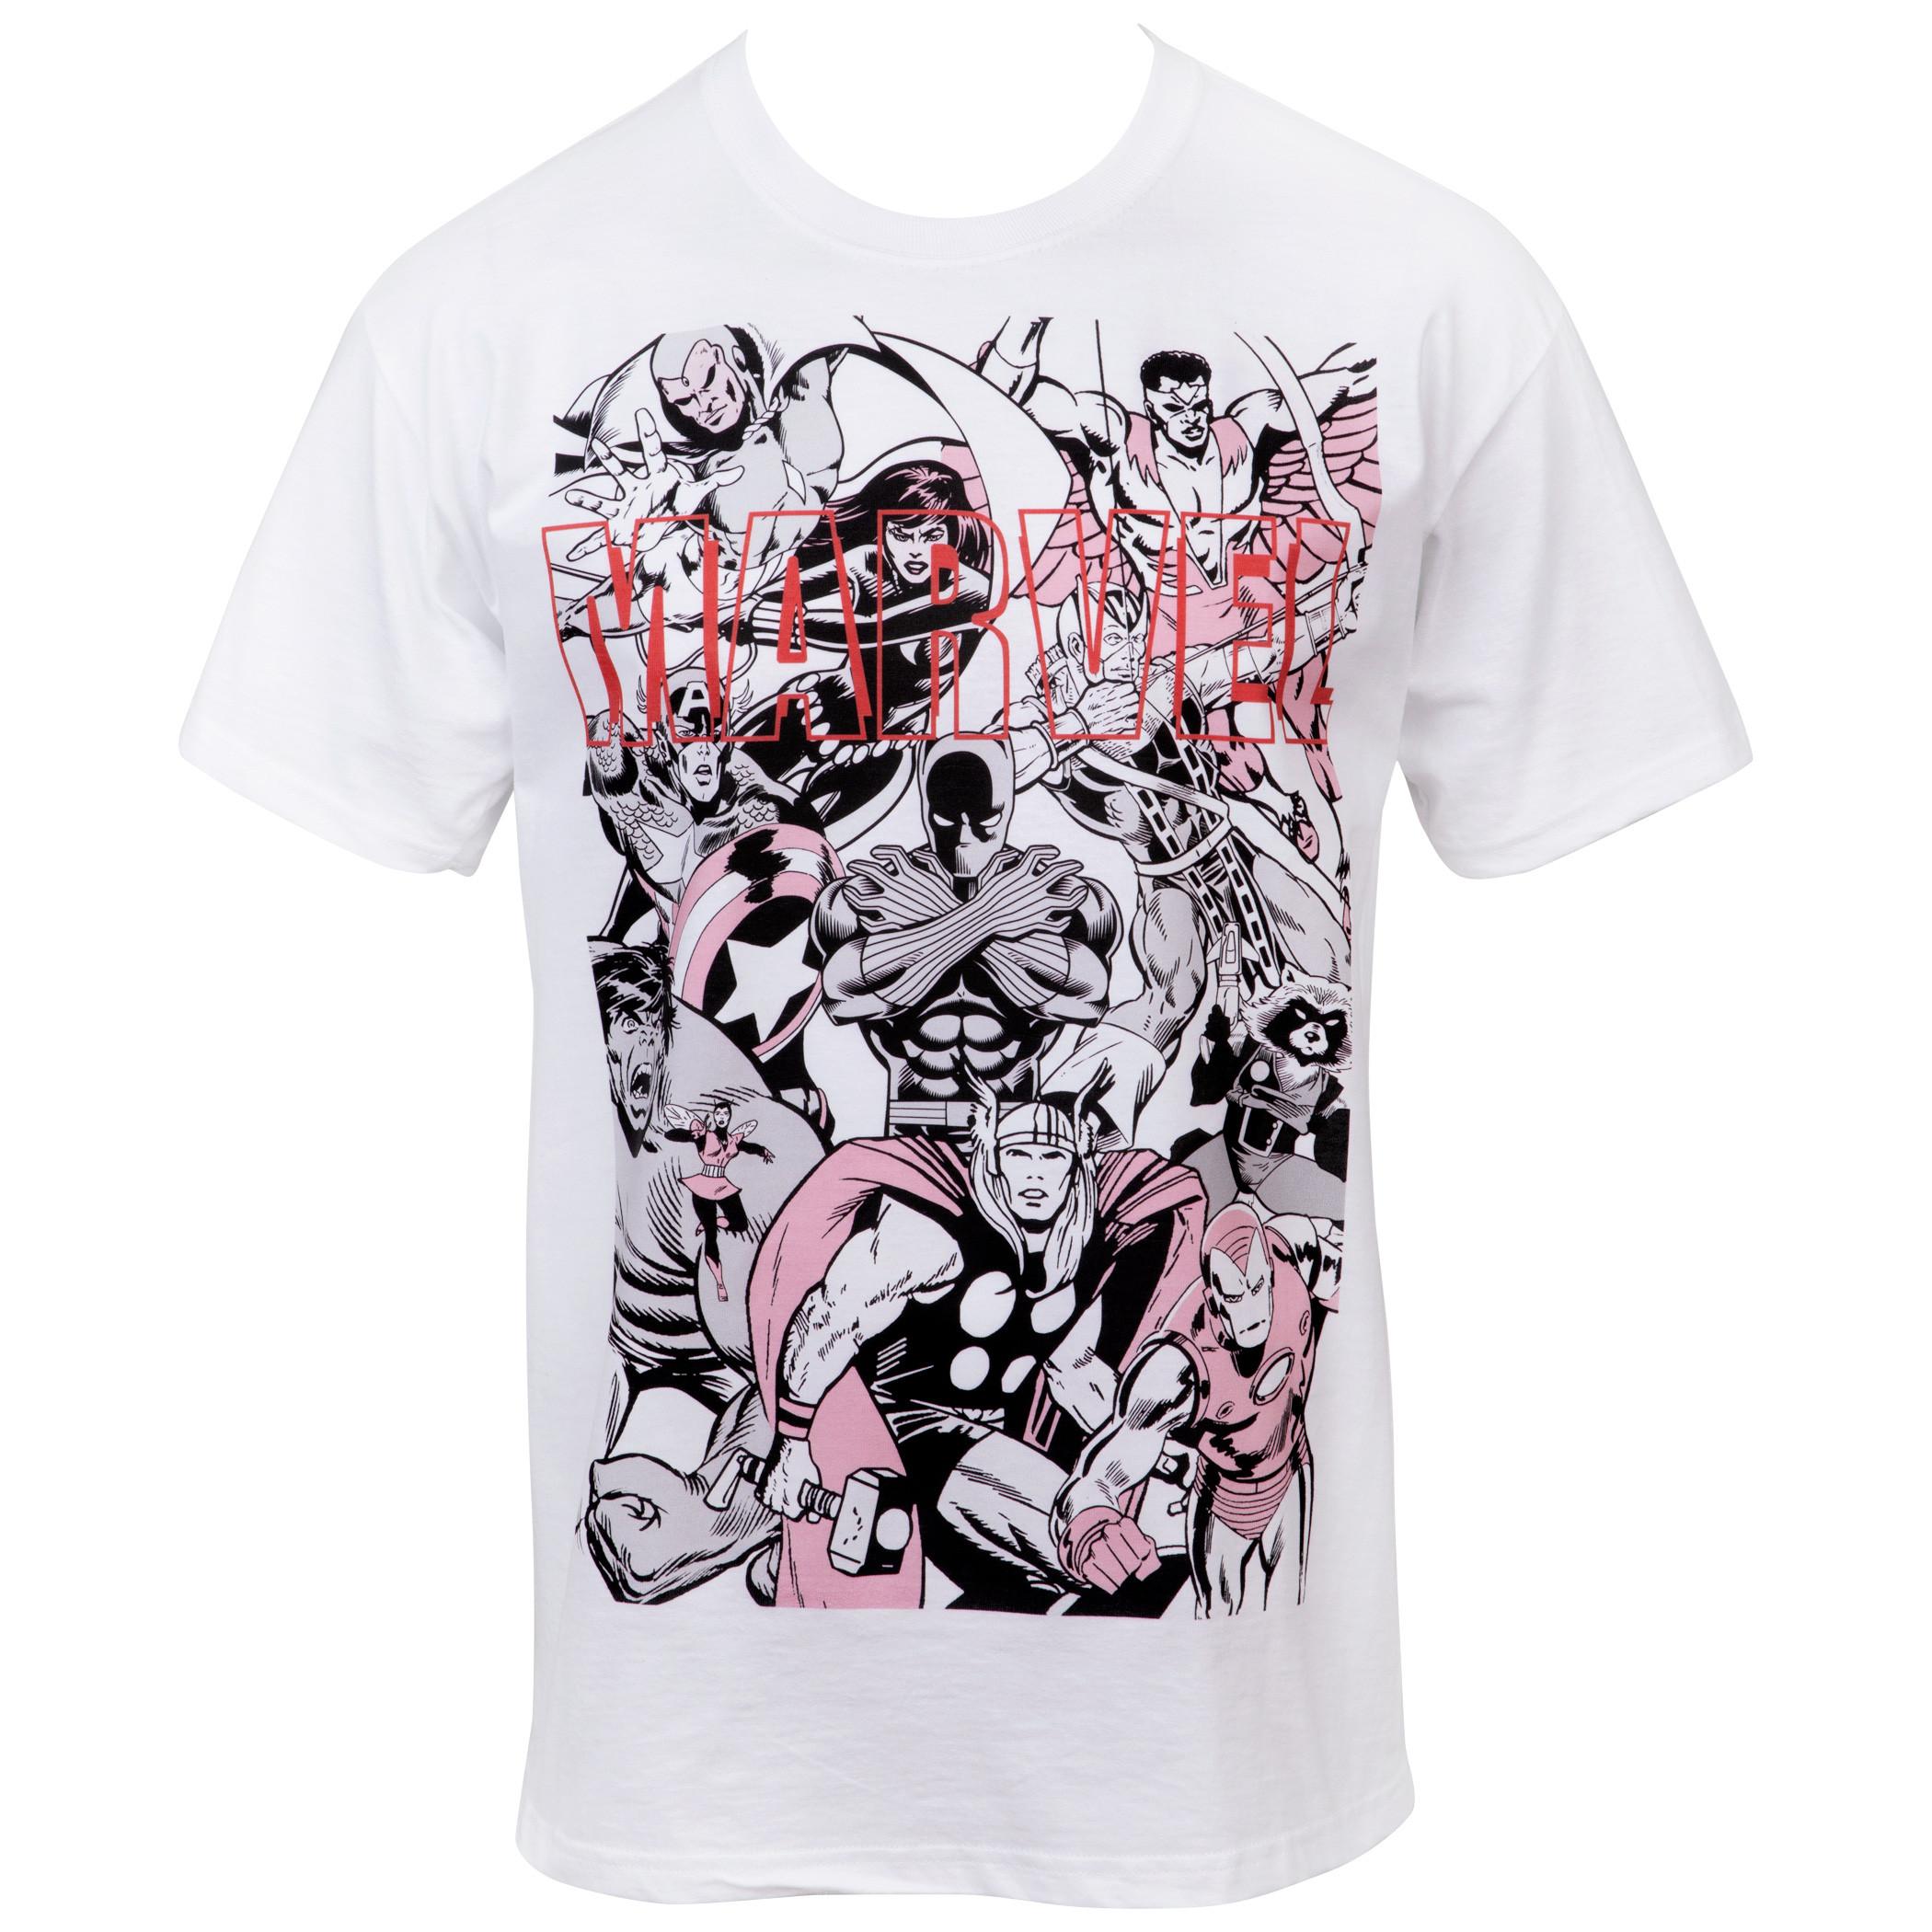 Marvel The Avengers Group Shot Minimalist T-Shirt